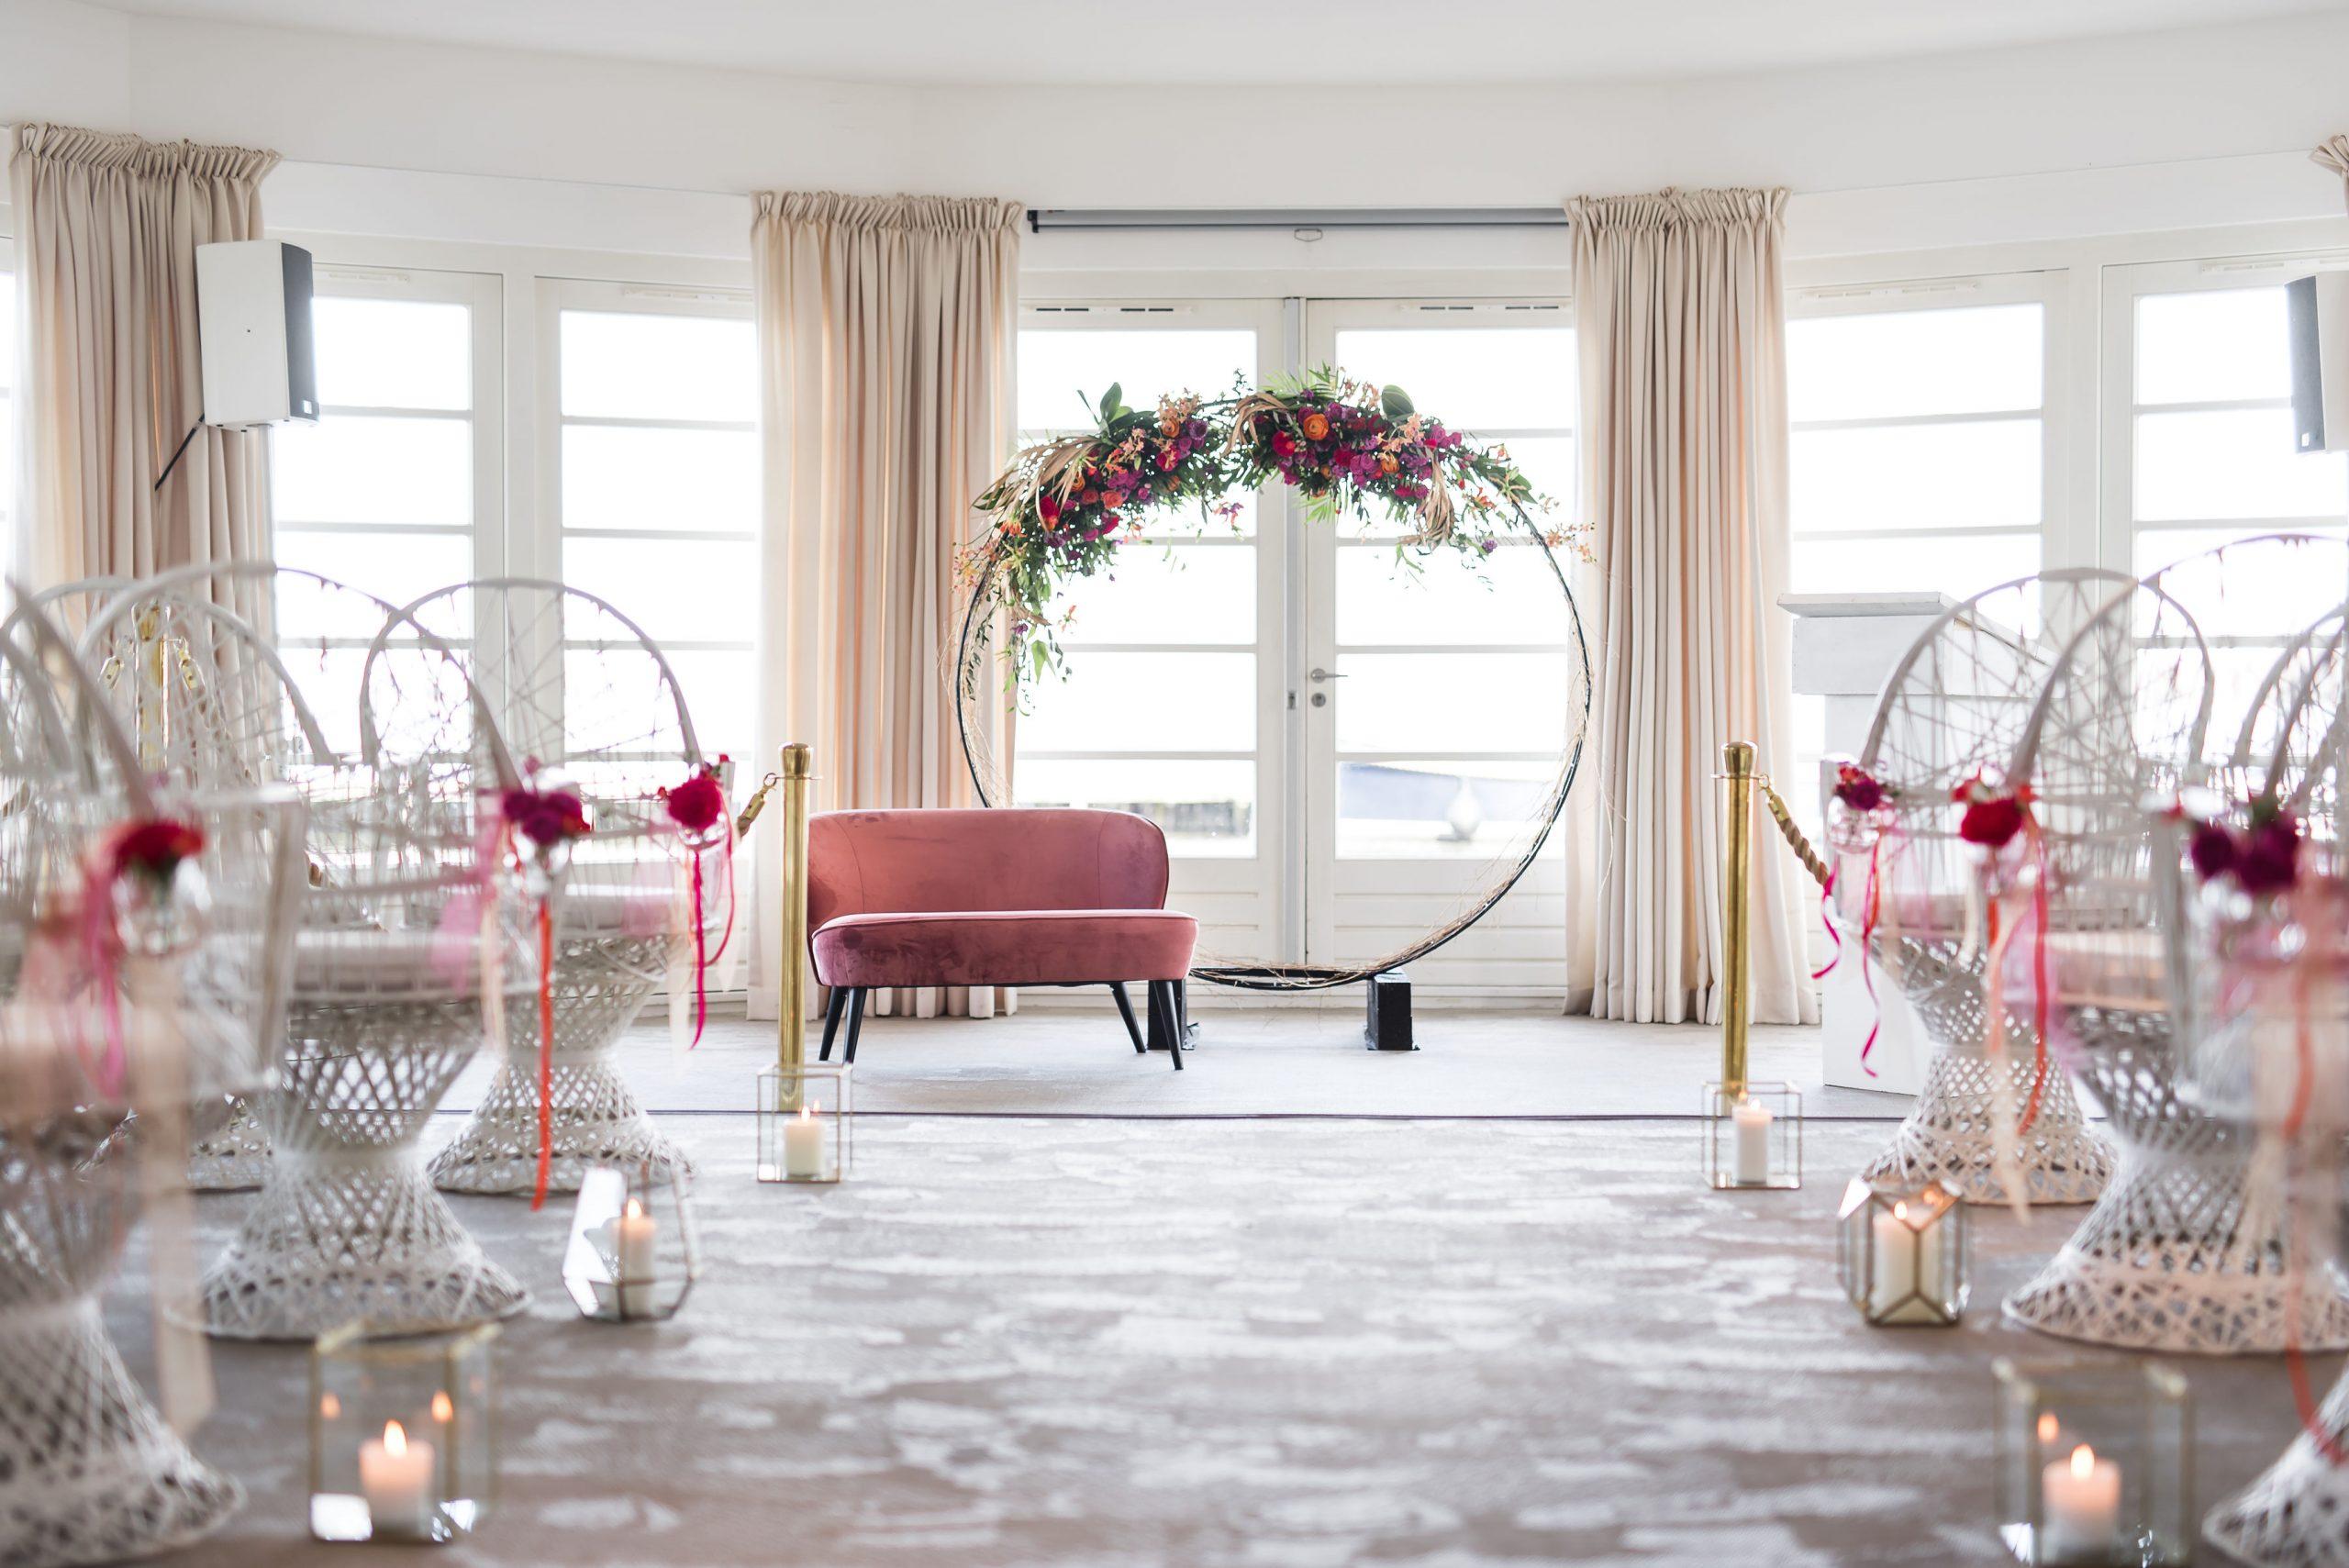 Danielle van der Lee, CEO Weddingplanners International